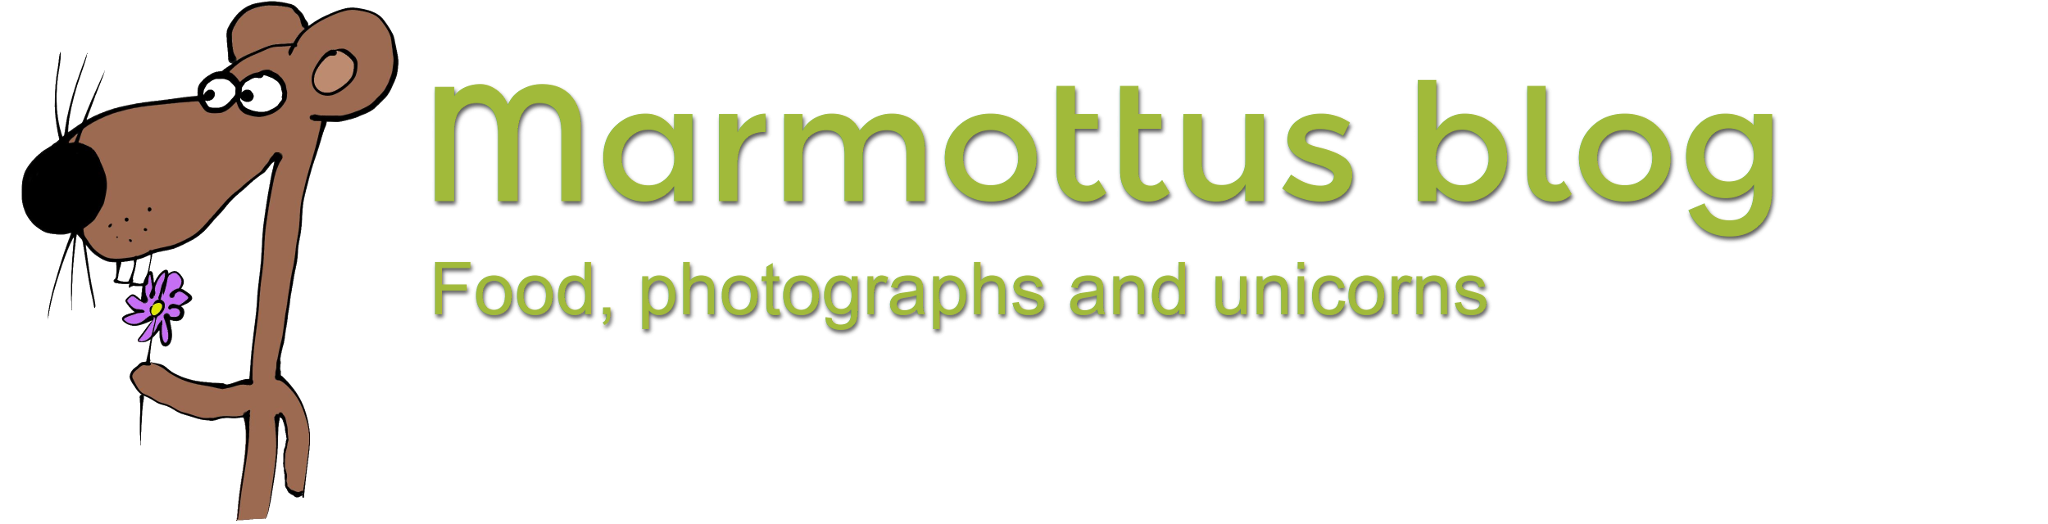 Marmottus Blog